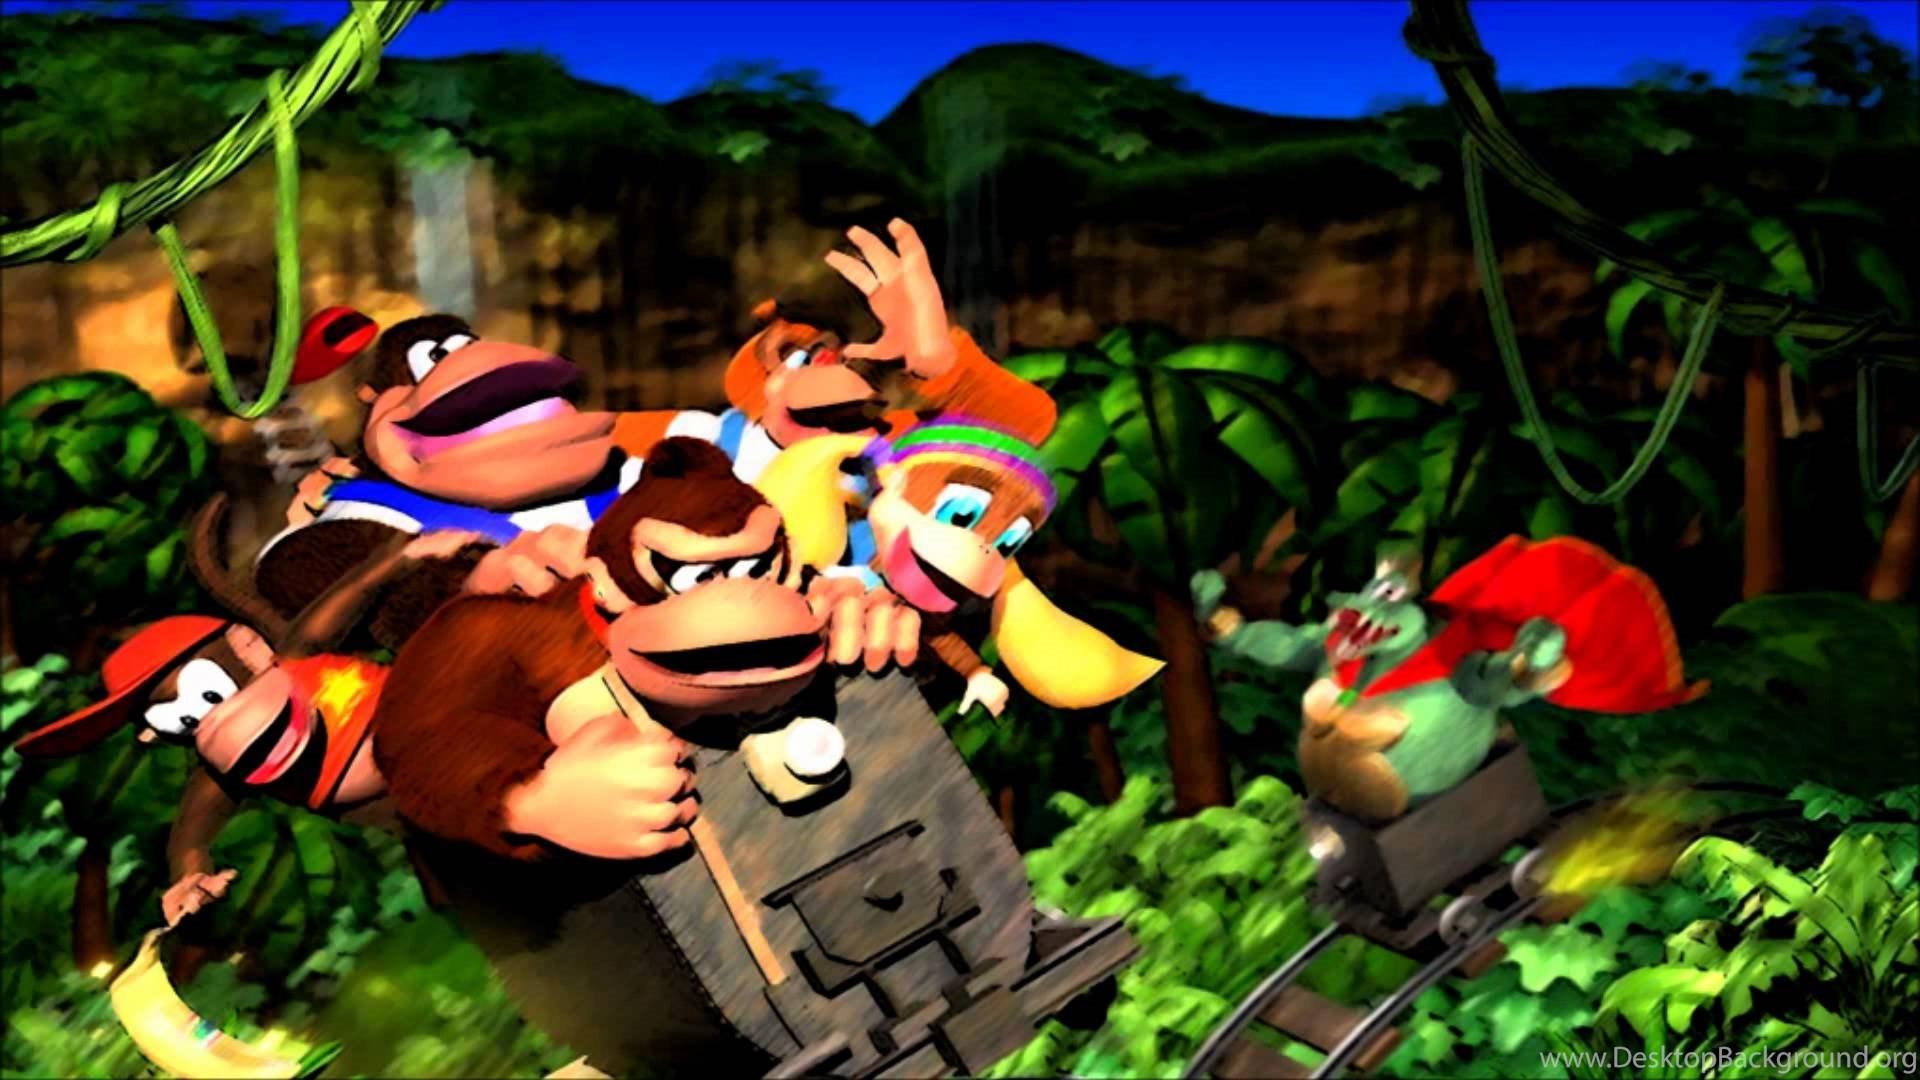 Great Wallpaper Home Screen Donkey Kong - 557909_best-donkey-kong-64-hd-game-wallpapers-hd-wallpapers_1920x1080_h  Image_483122.jpg